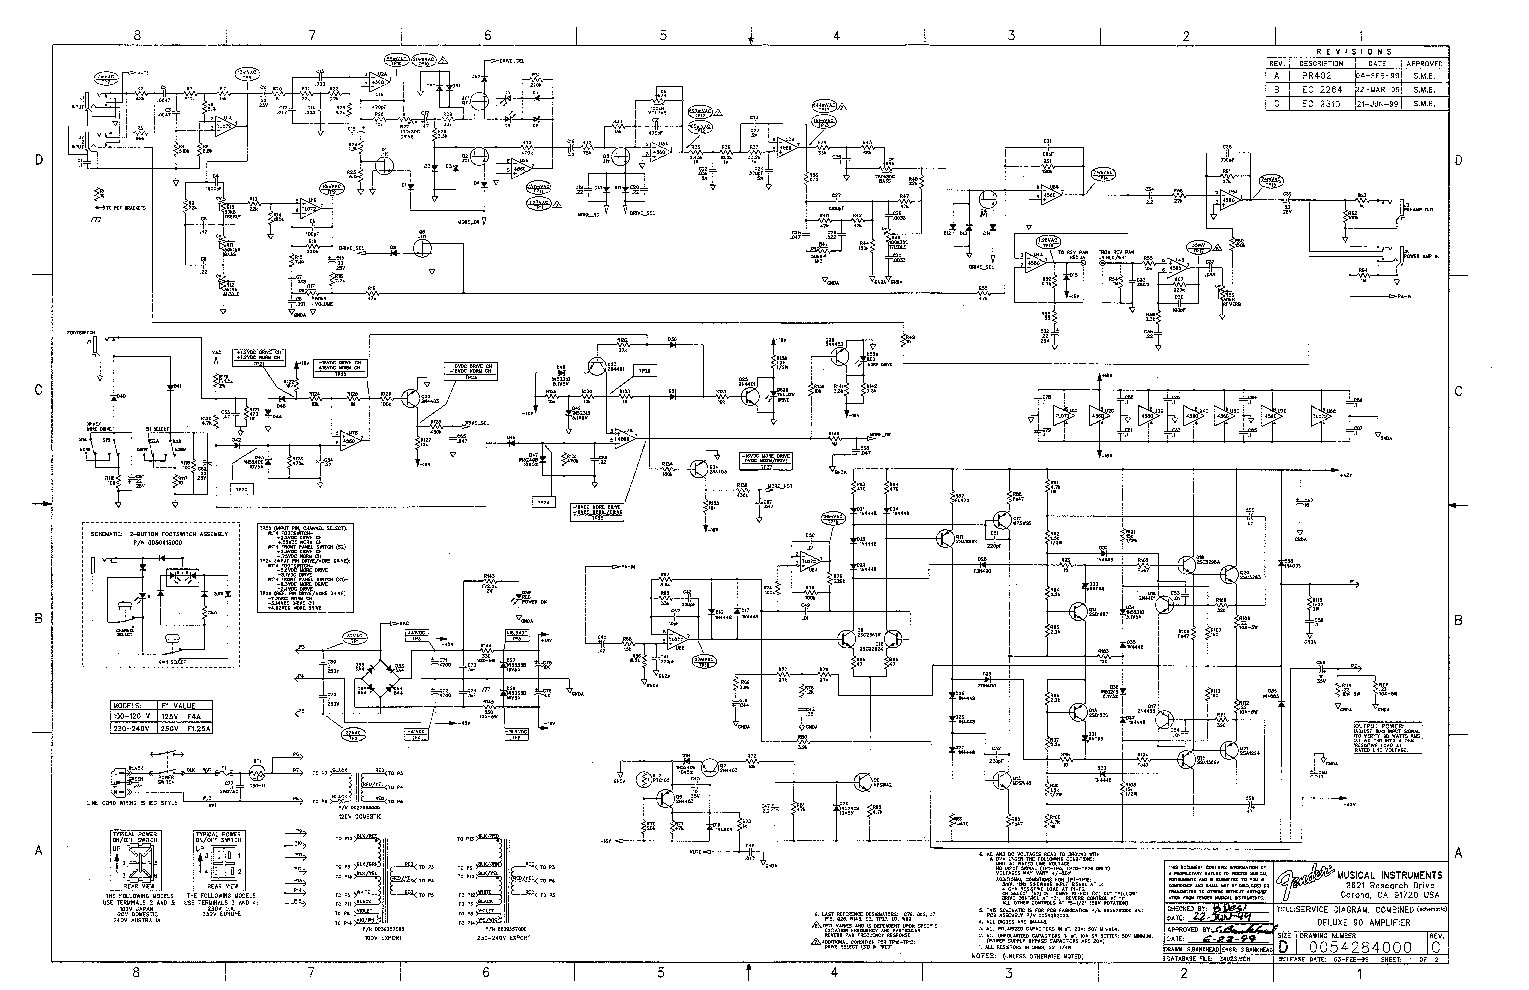 Fender Deluxe 90 Sch Service Manual Download Schematics